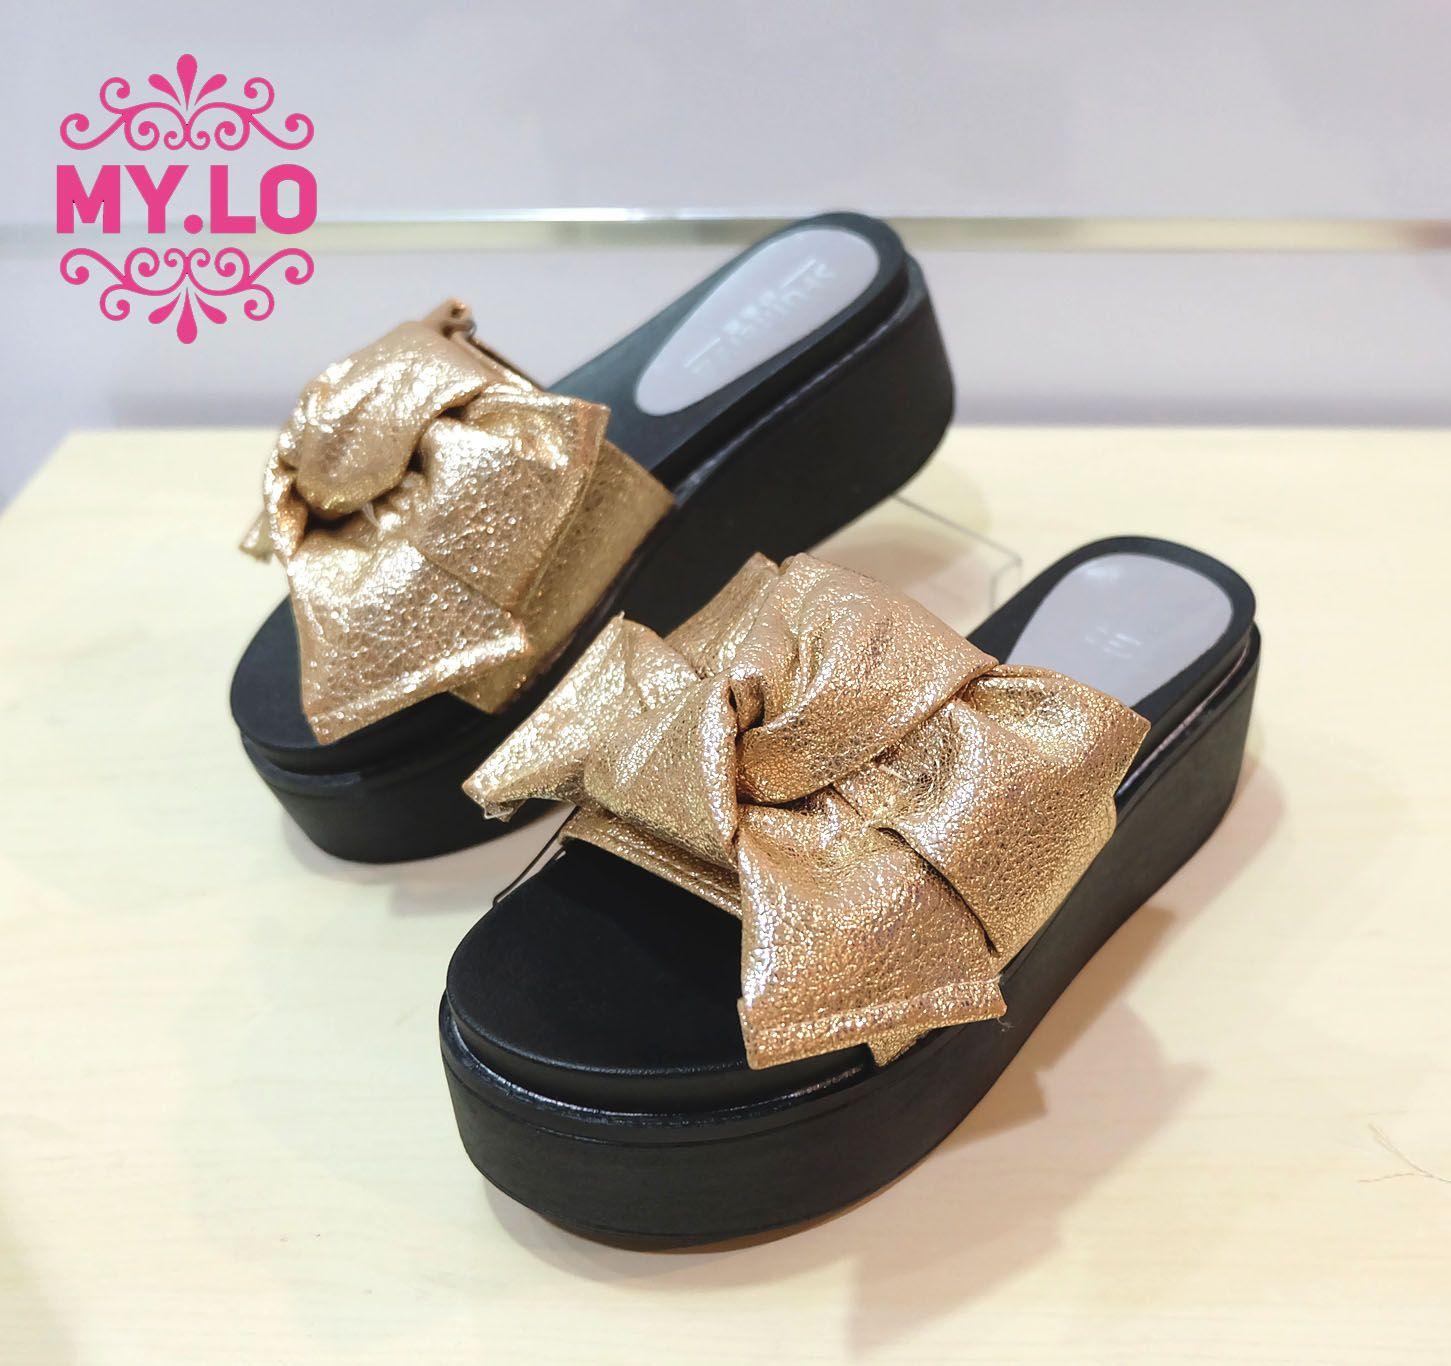 Kode Ms6a02 Warna Gold Size 35 39 Harga 200rb Foto Real Pic Kualitas Import High Quality Pemesanan Via Sms Sepatu Dan Pesta